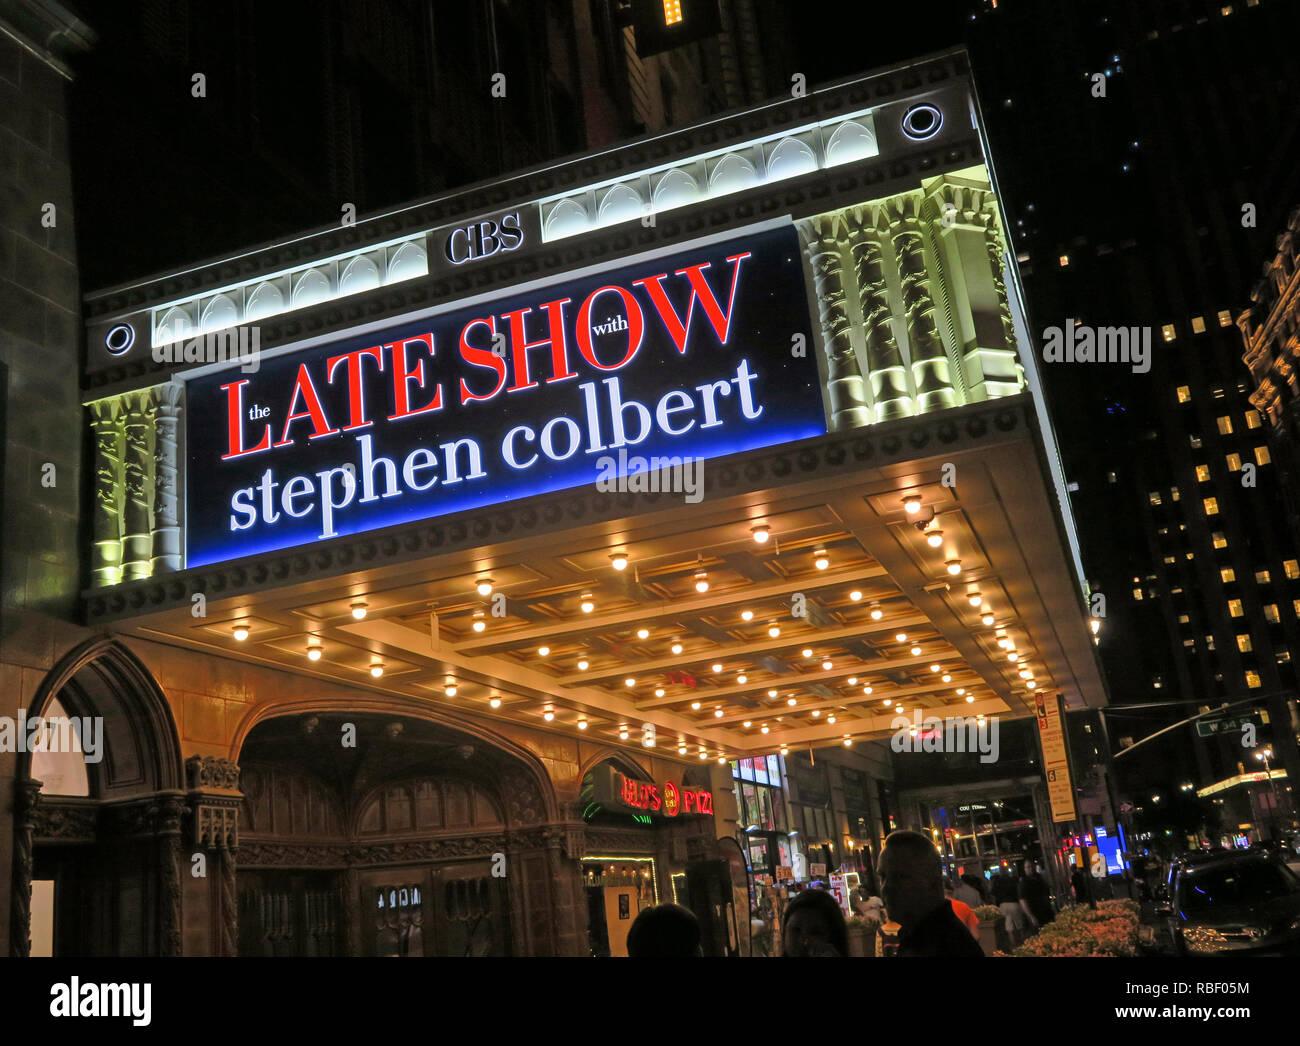 GoTonySmith,@HotpixUK,HotpixUK,Broadway NYC,theatre,NYC,New York City,Broadway,Theatre District,district,New York,New York Street,USA,America,City Centre,city,centre,New York Travel Tourism,Ed Sullivan,CBS,actor,late,night,entrance,door,American,Late Show,Stephen Colbert,1697 Broadway,NY 10019-5904,nighttime,lights,lit,TV Show,CBS Show,people,ticket